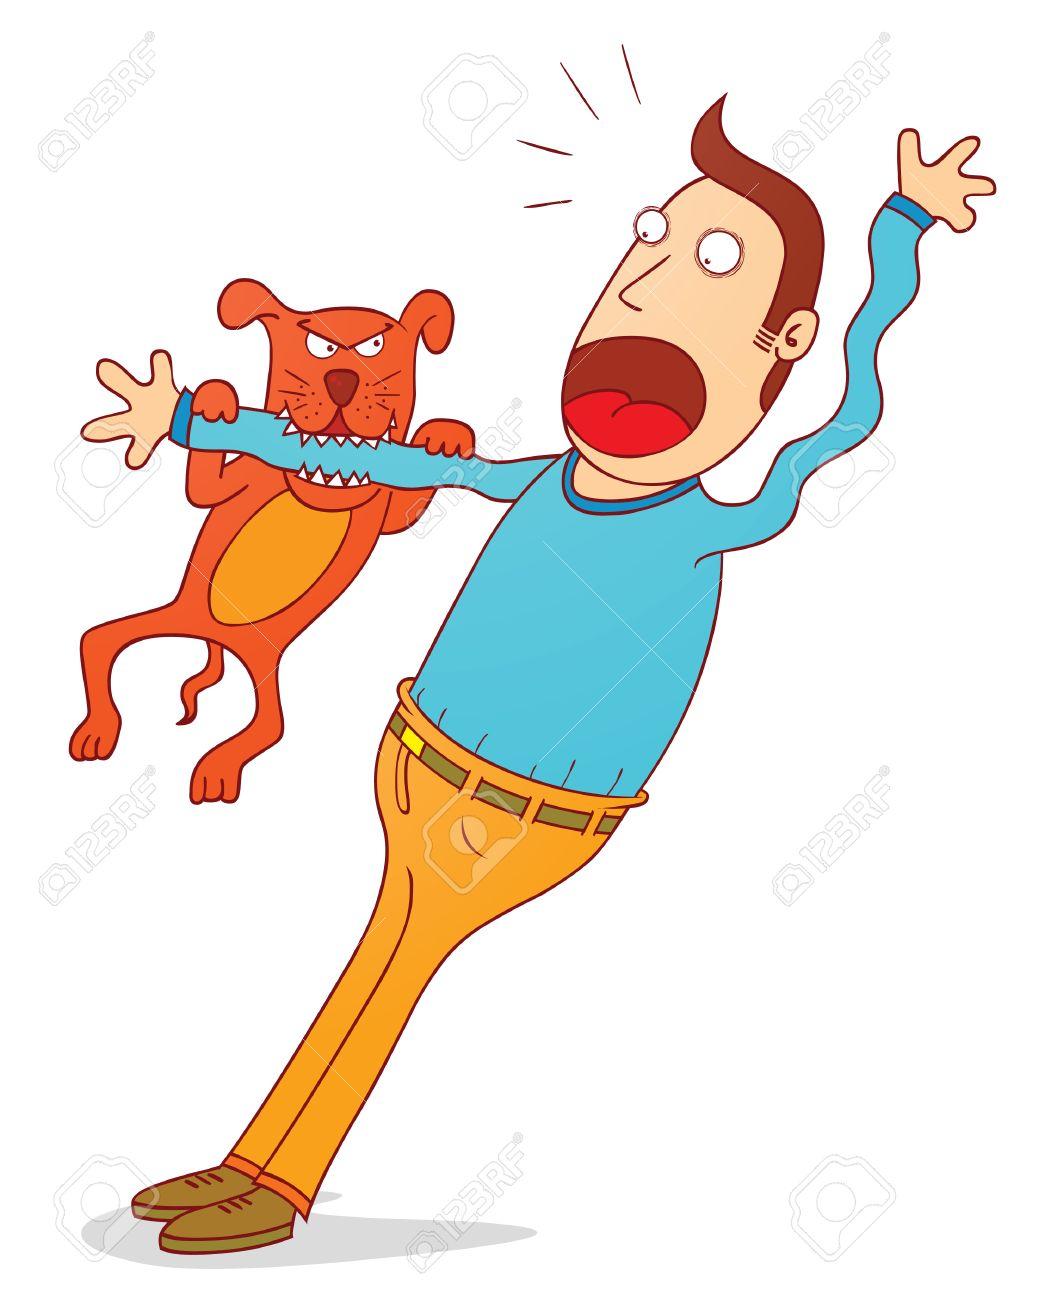 1057x1300 836 Bad Dog Stock Vector Illustration And Royalty Free Bad Dog Clipart